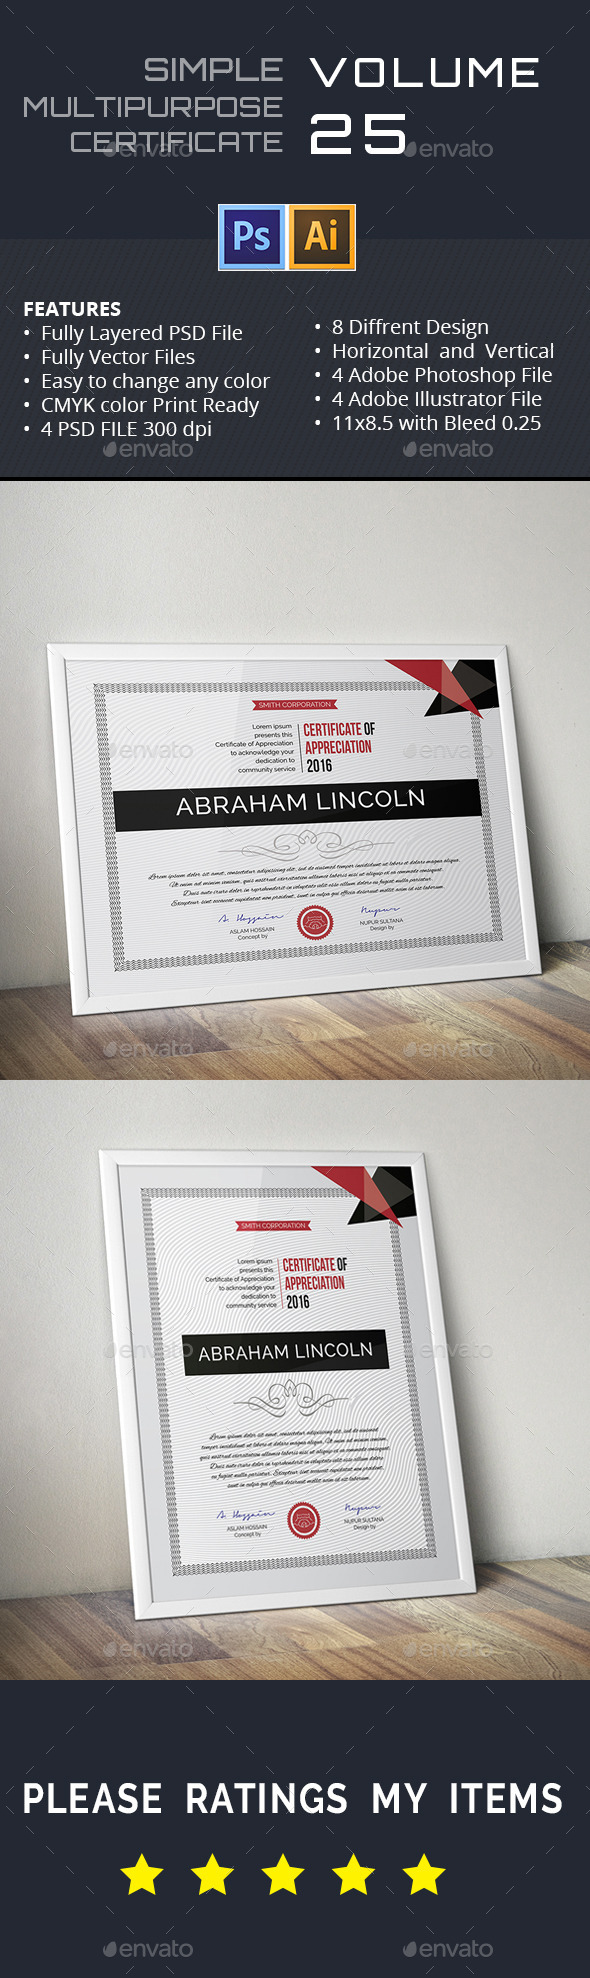 GraphicRiver Multipurpose Certificate GD025 11894754